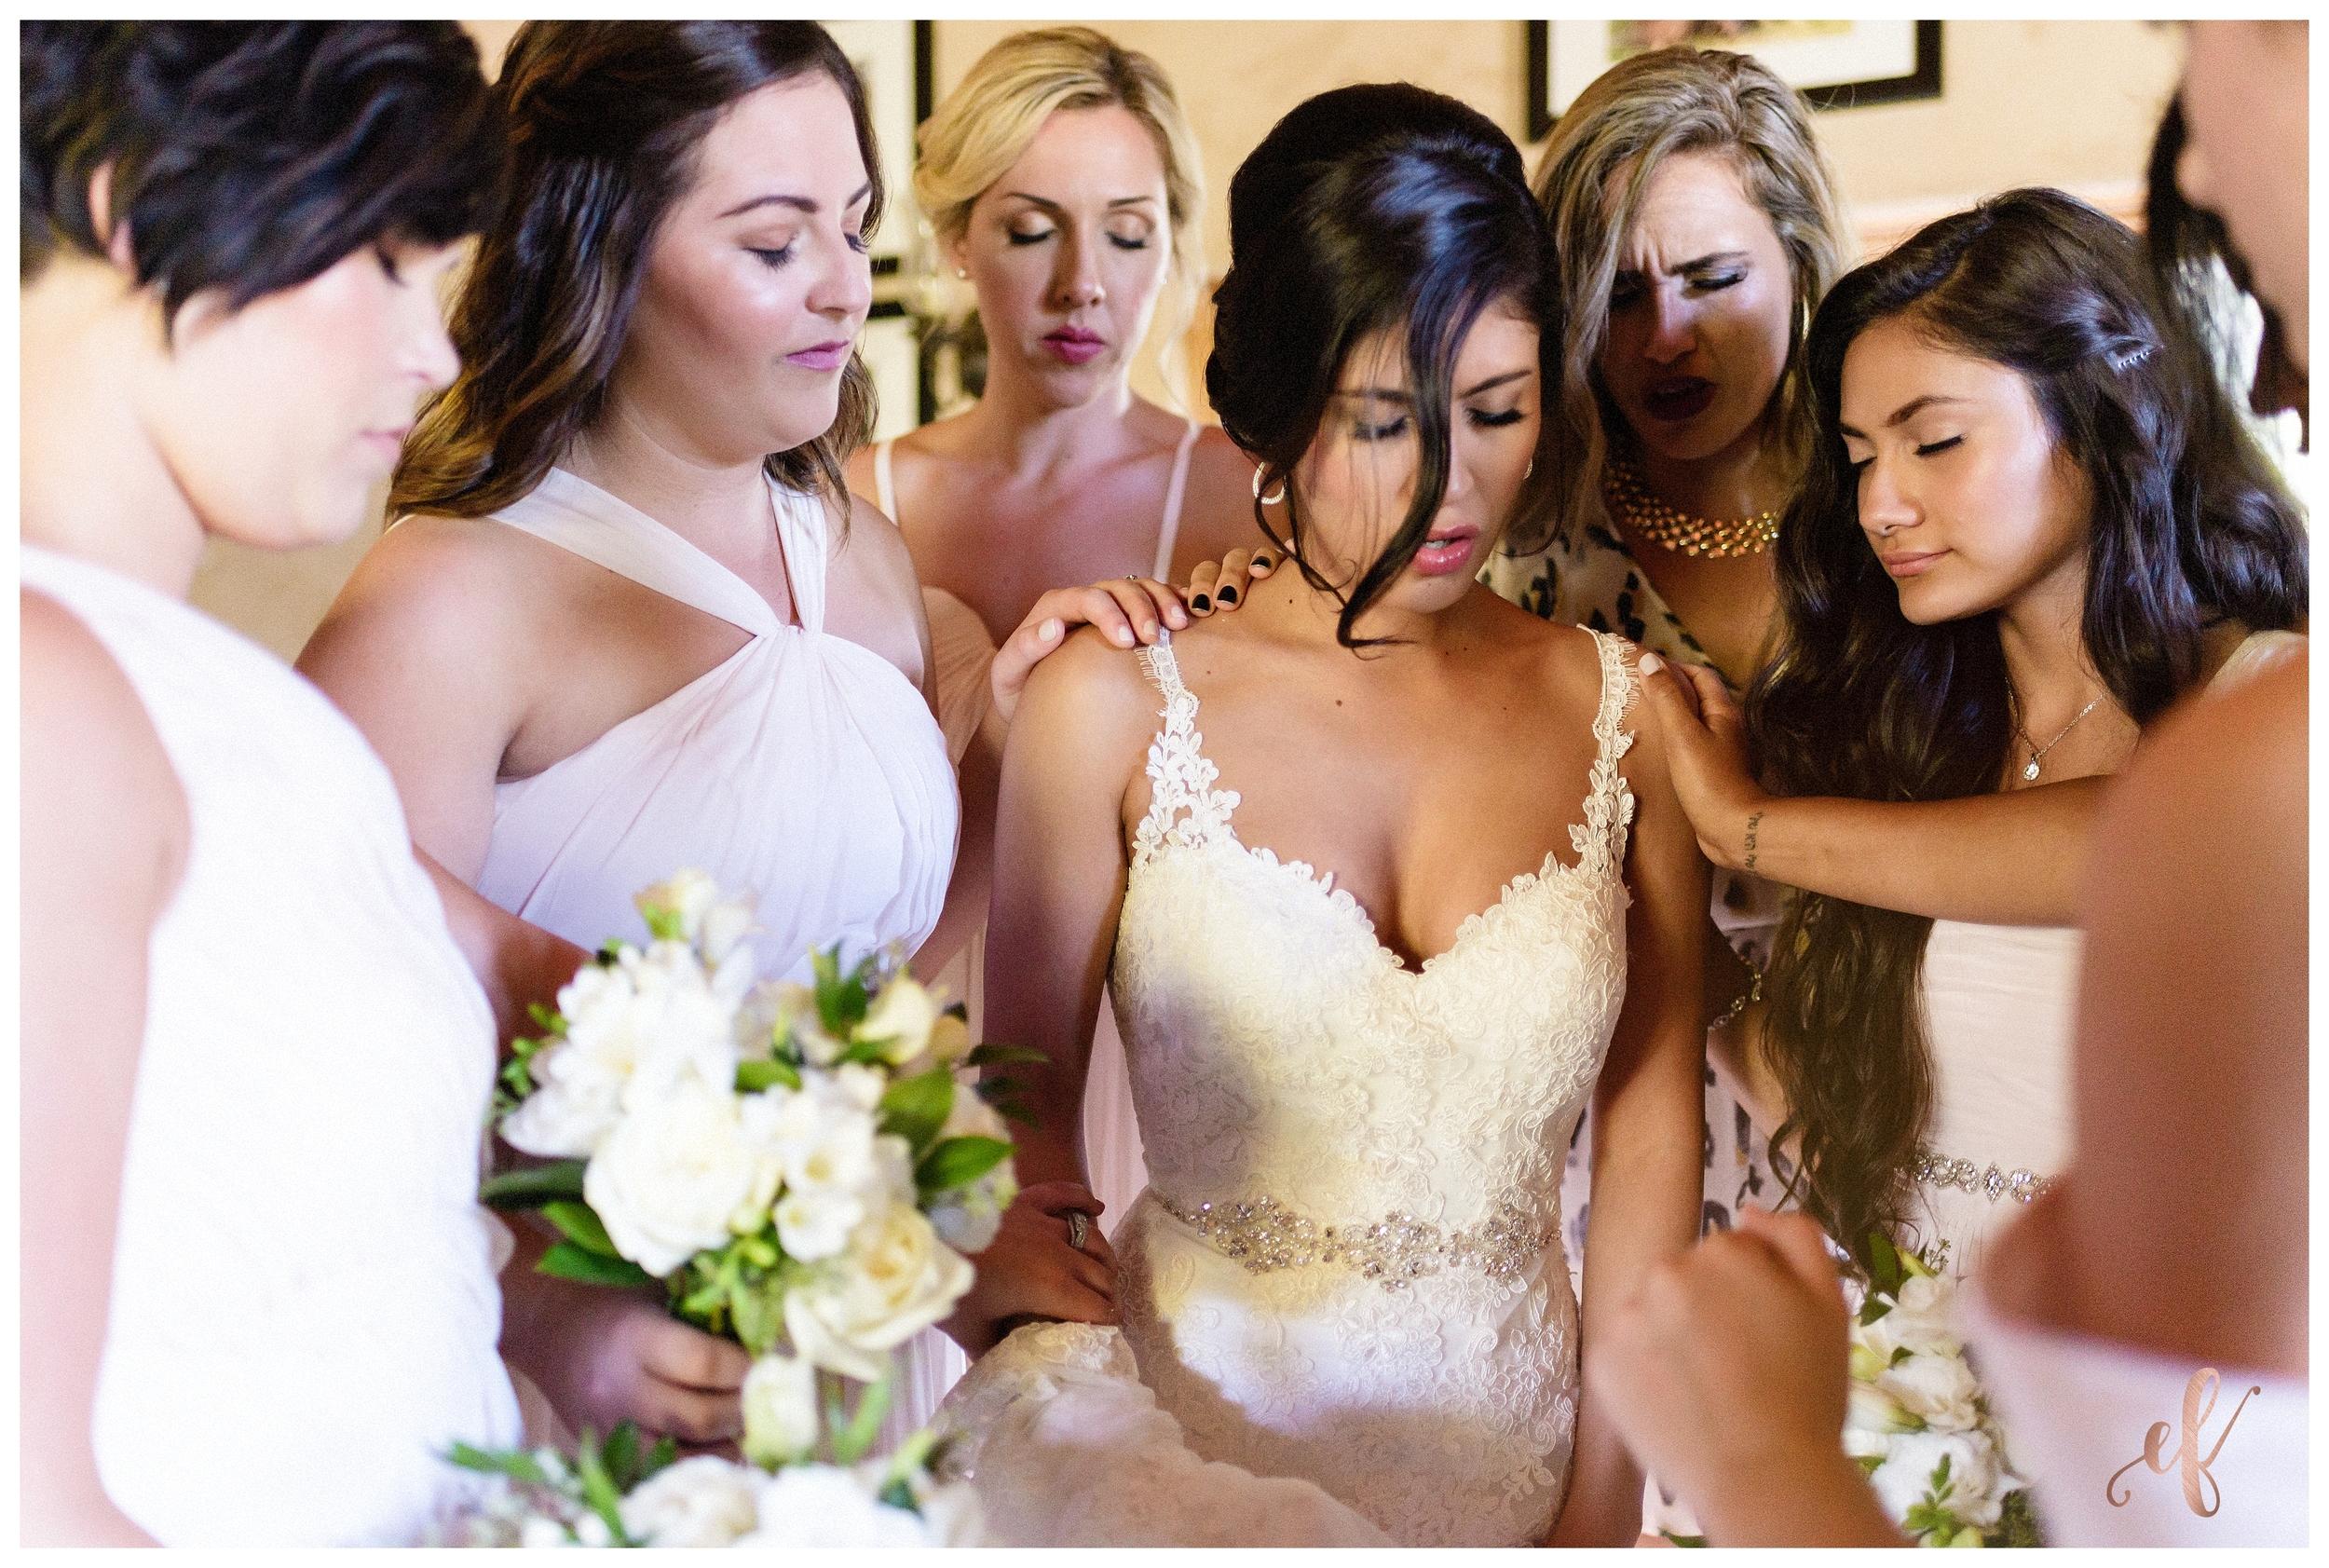 San Diego Wedding Photographer   Ernie & Fiona Photography   Bride   Bridesmaids   Prayer